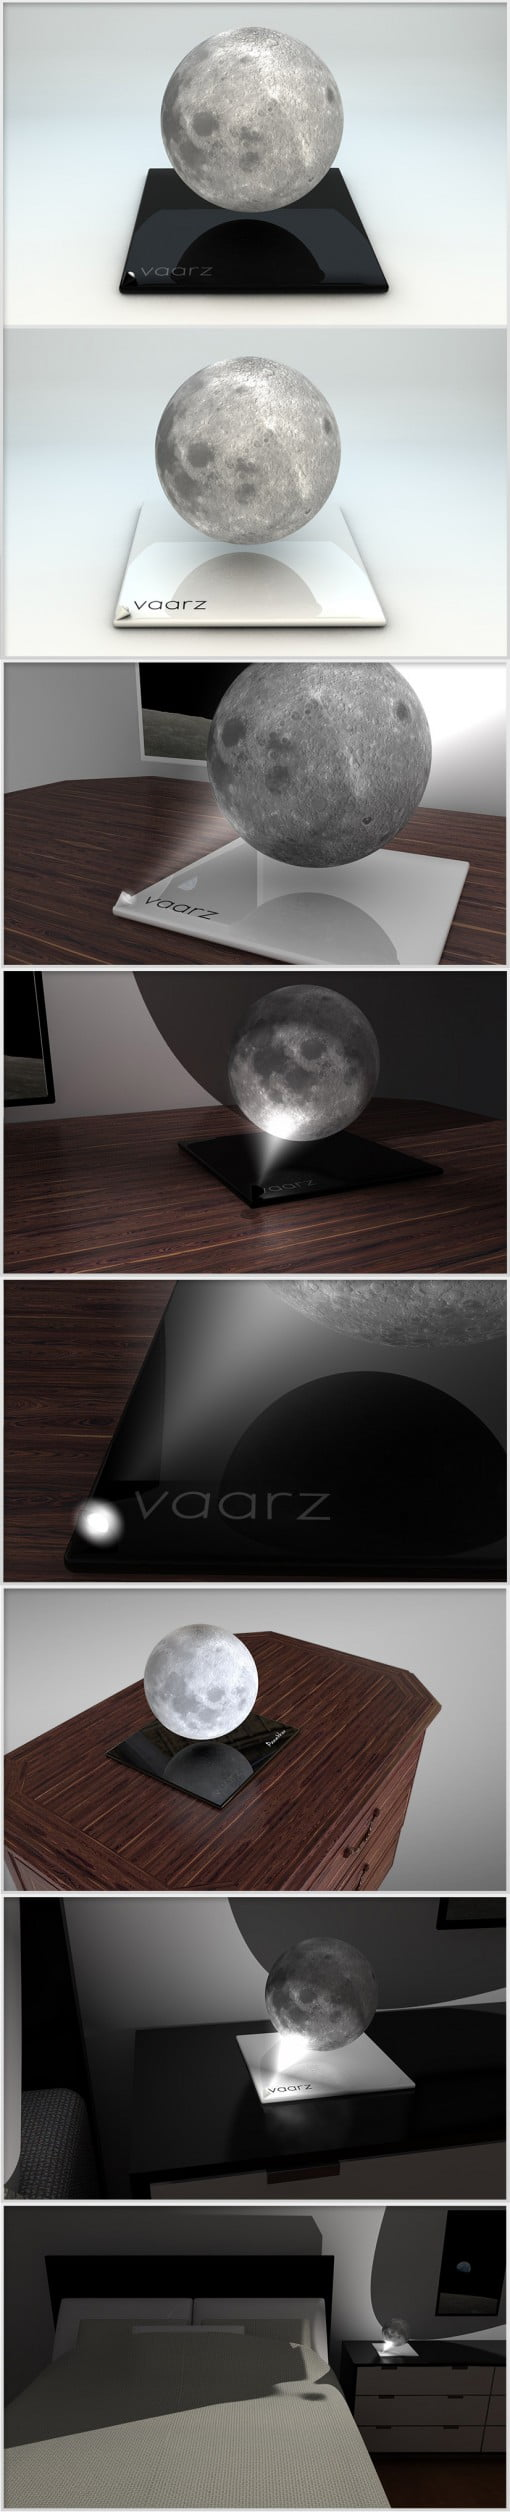 vaarz Mond Nachtischlampe